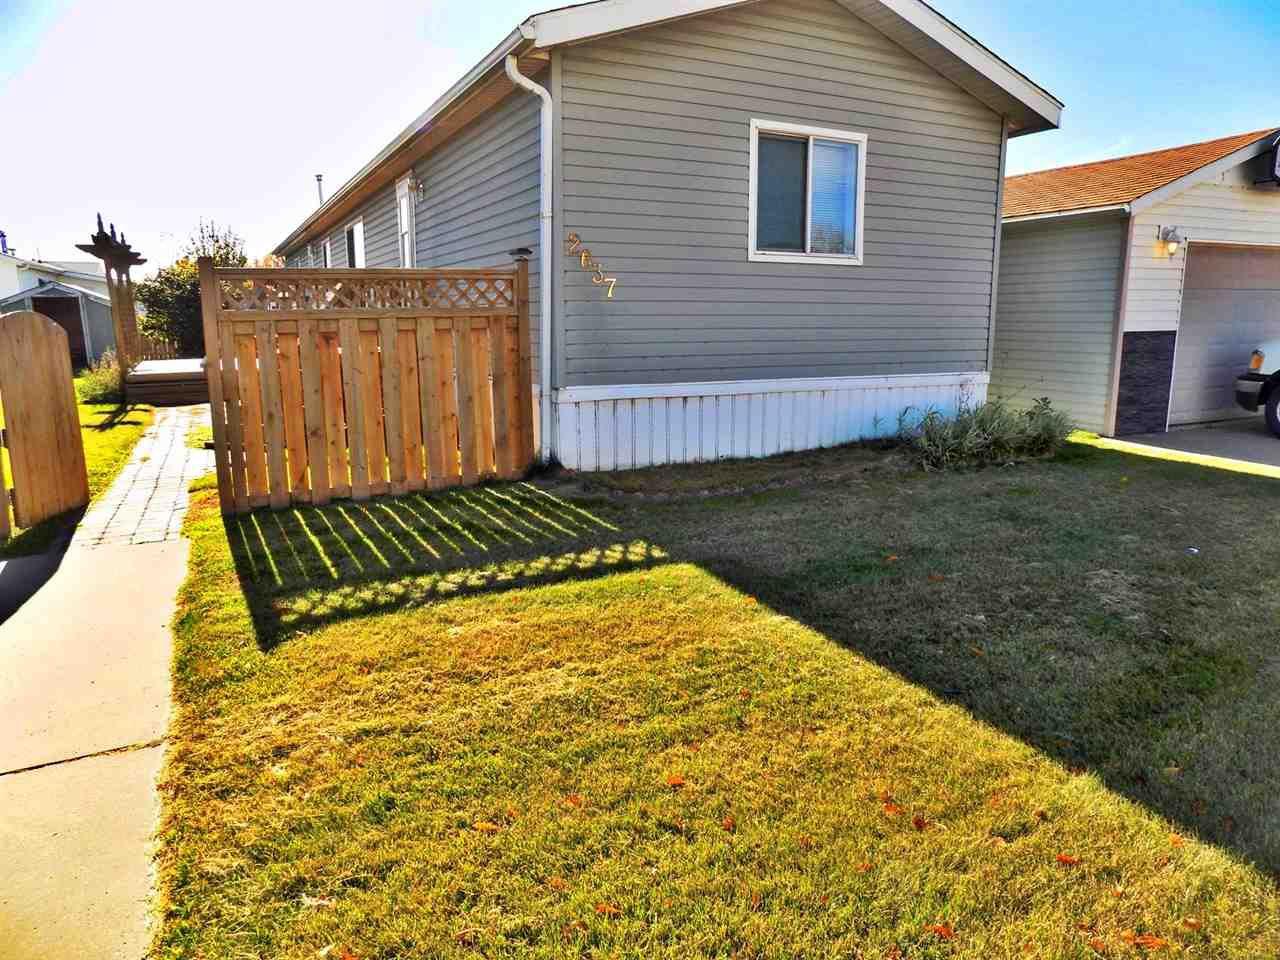 Main Photo: 2637 10770 Winterburn Road in Edmonton: Zone 59 Mobile for sale : MLS®# E4130682